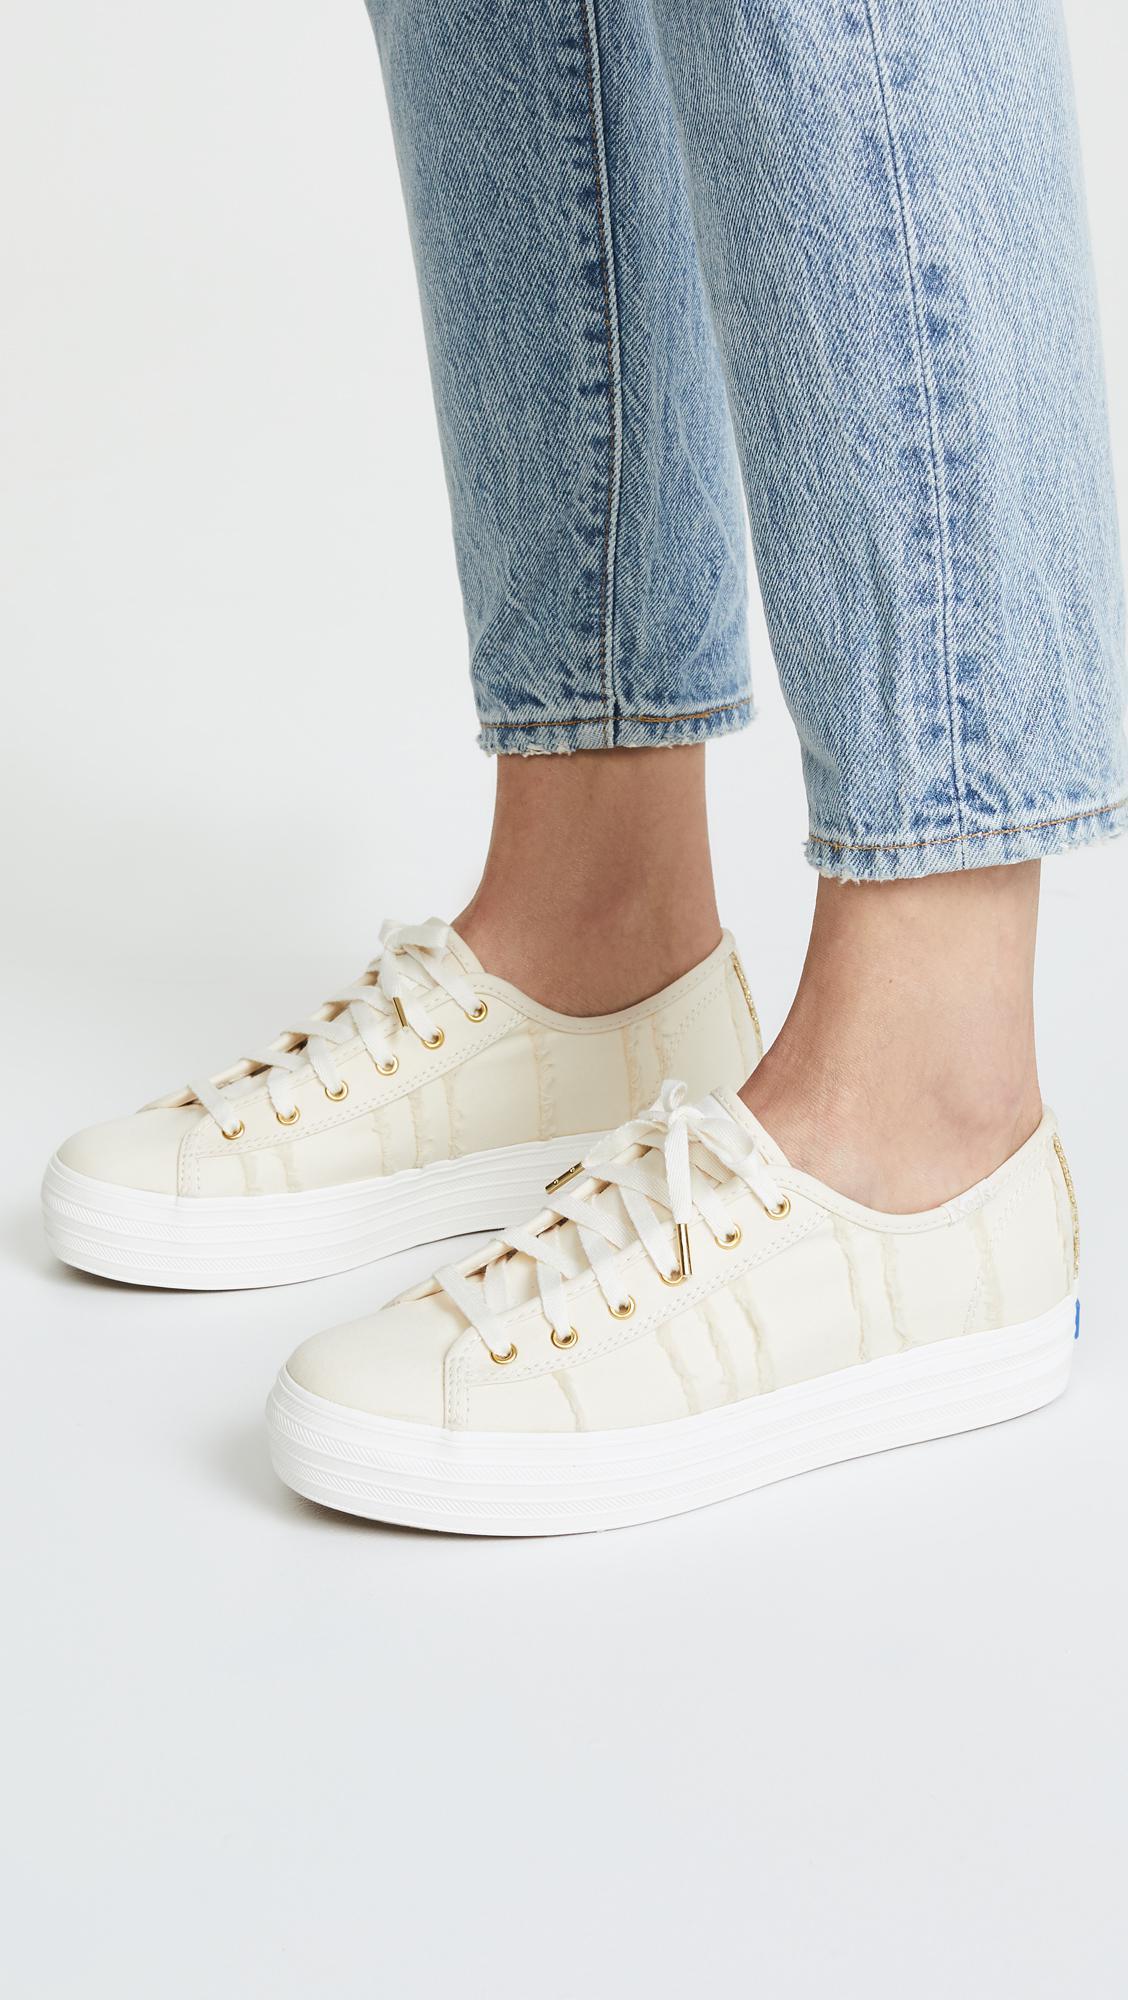 09920d83badb Keds Triple Kick Eyelash Lace Up Sneakers - Lyst